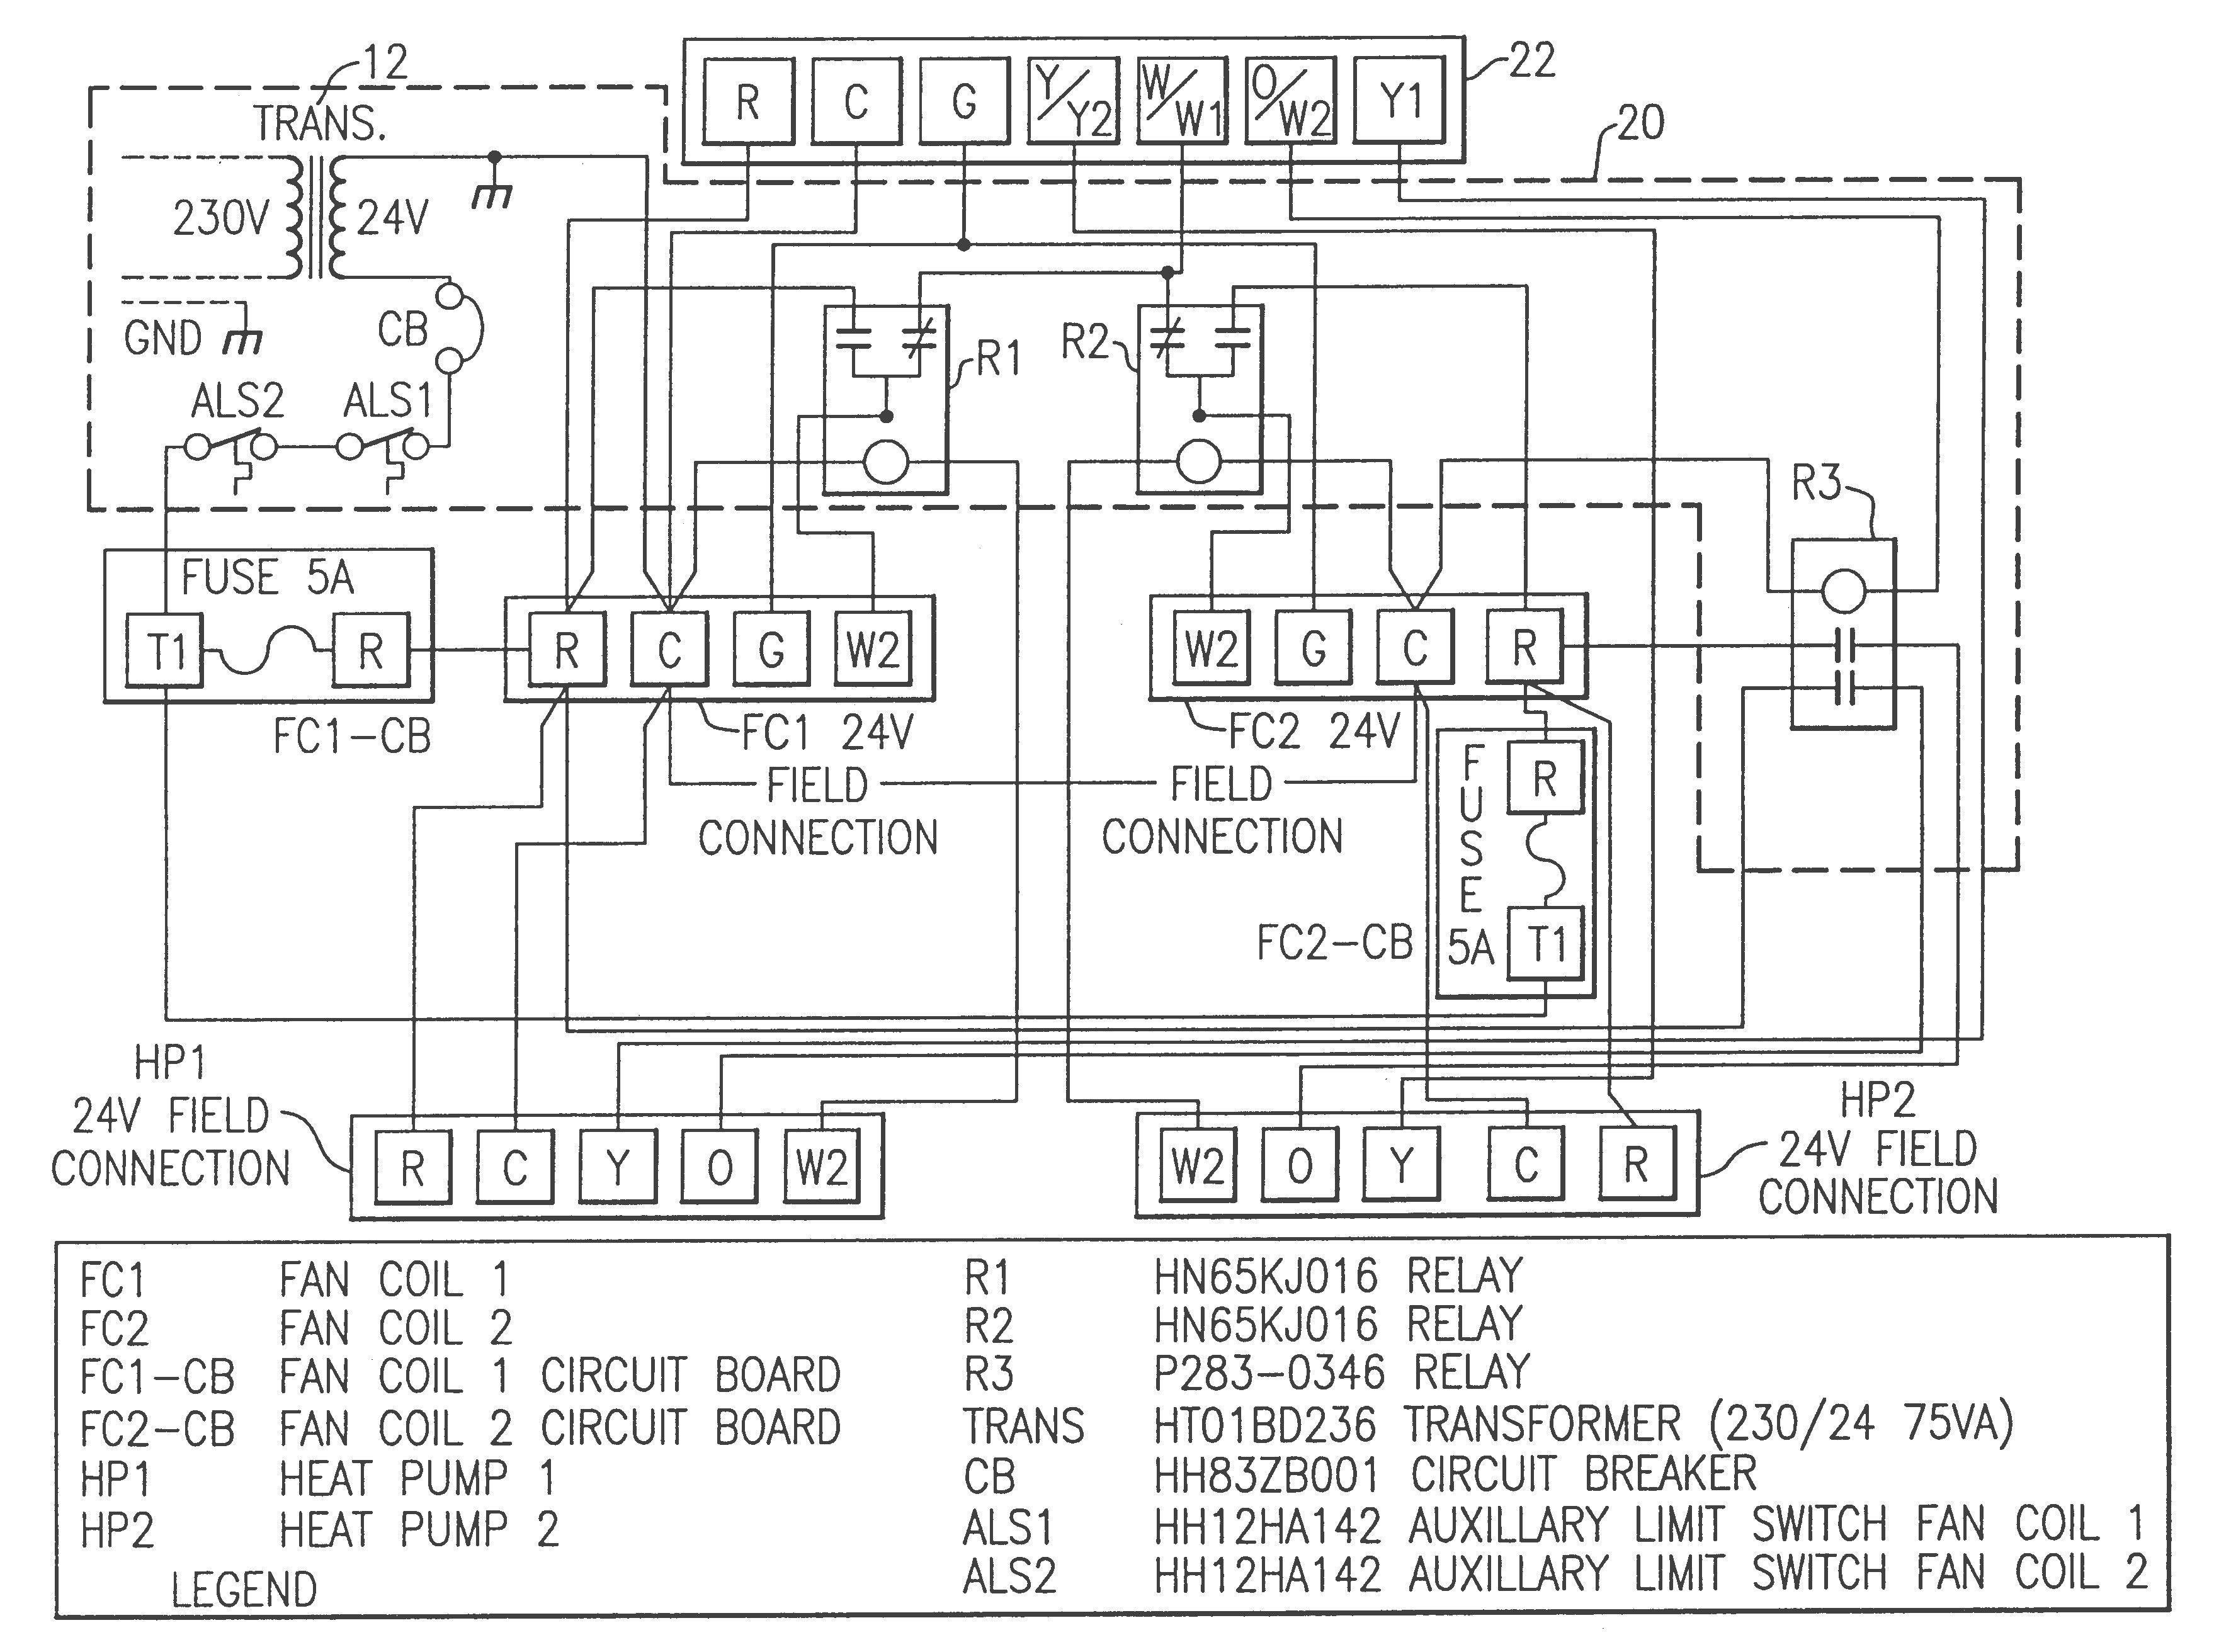 Wiring Diagram For Gmc Envoy